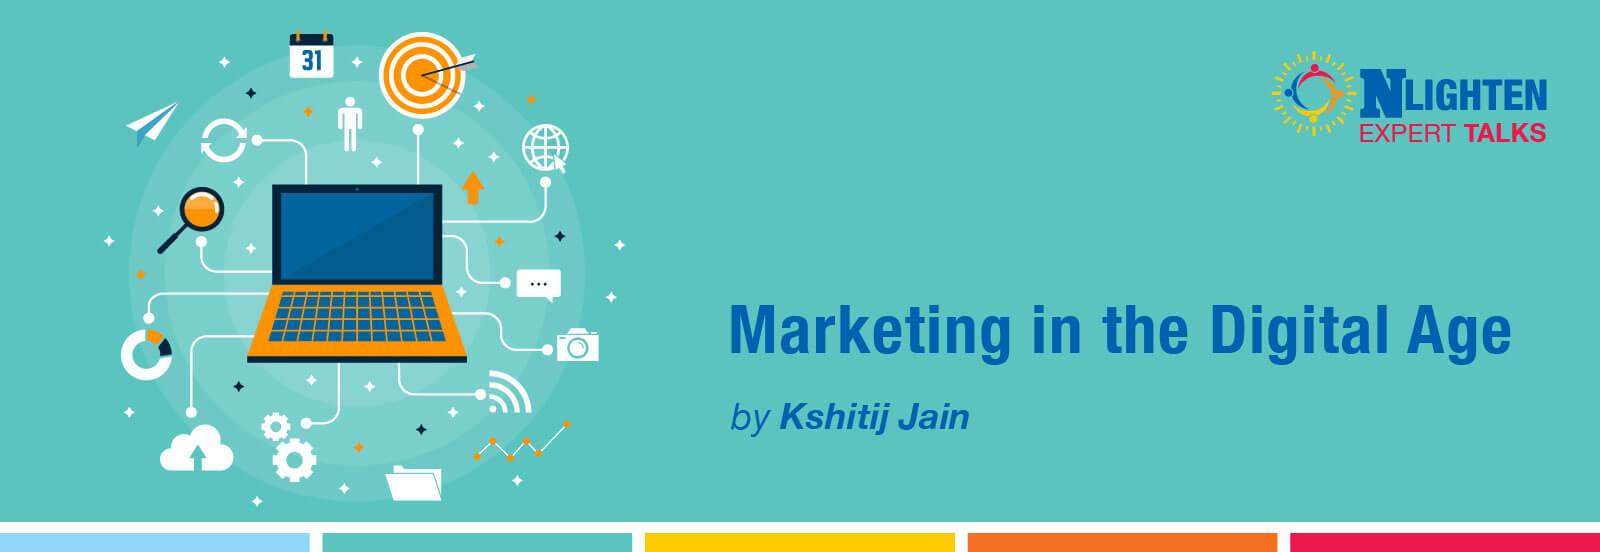 Marketing the digital age